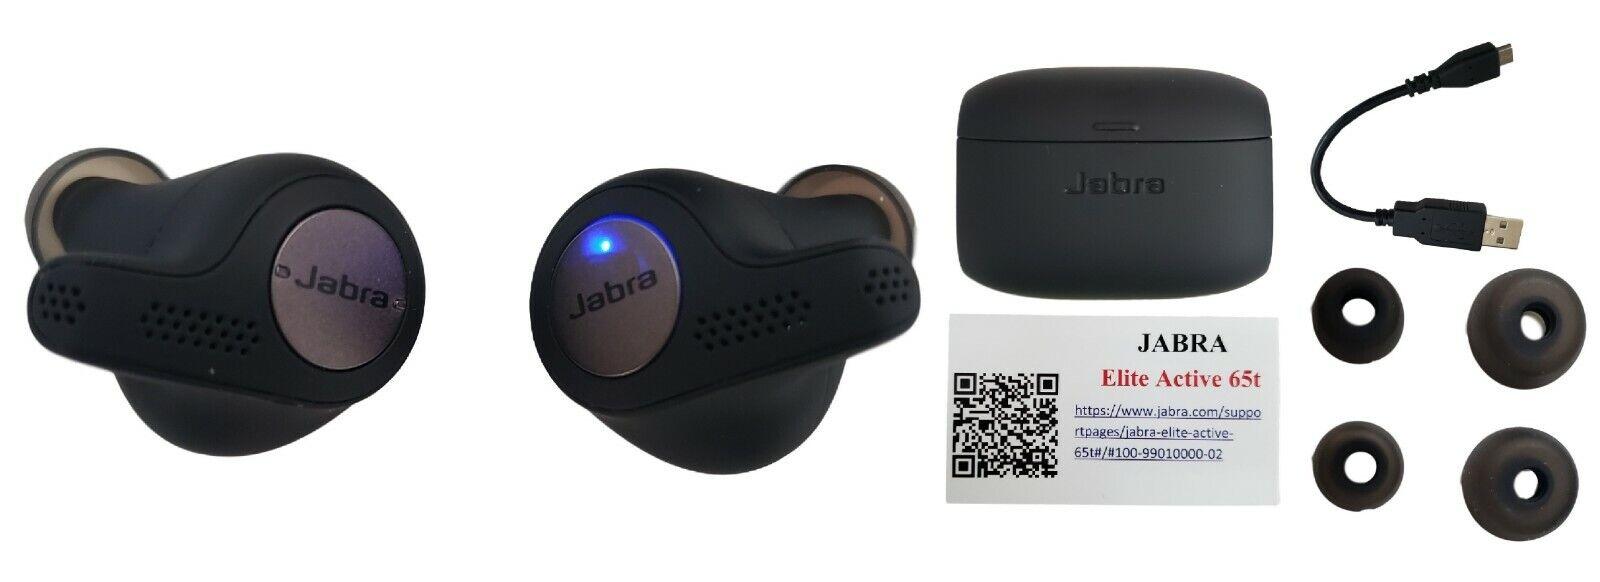 Jabra Elite Active 65t Bluetooth Headset Wireless Sports Earbuds Titanium Black